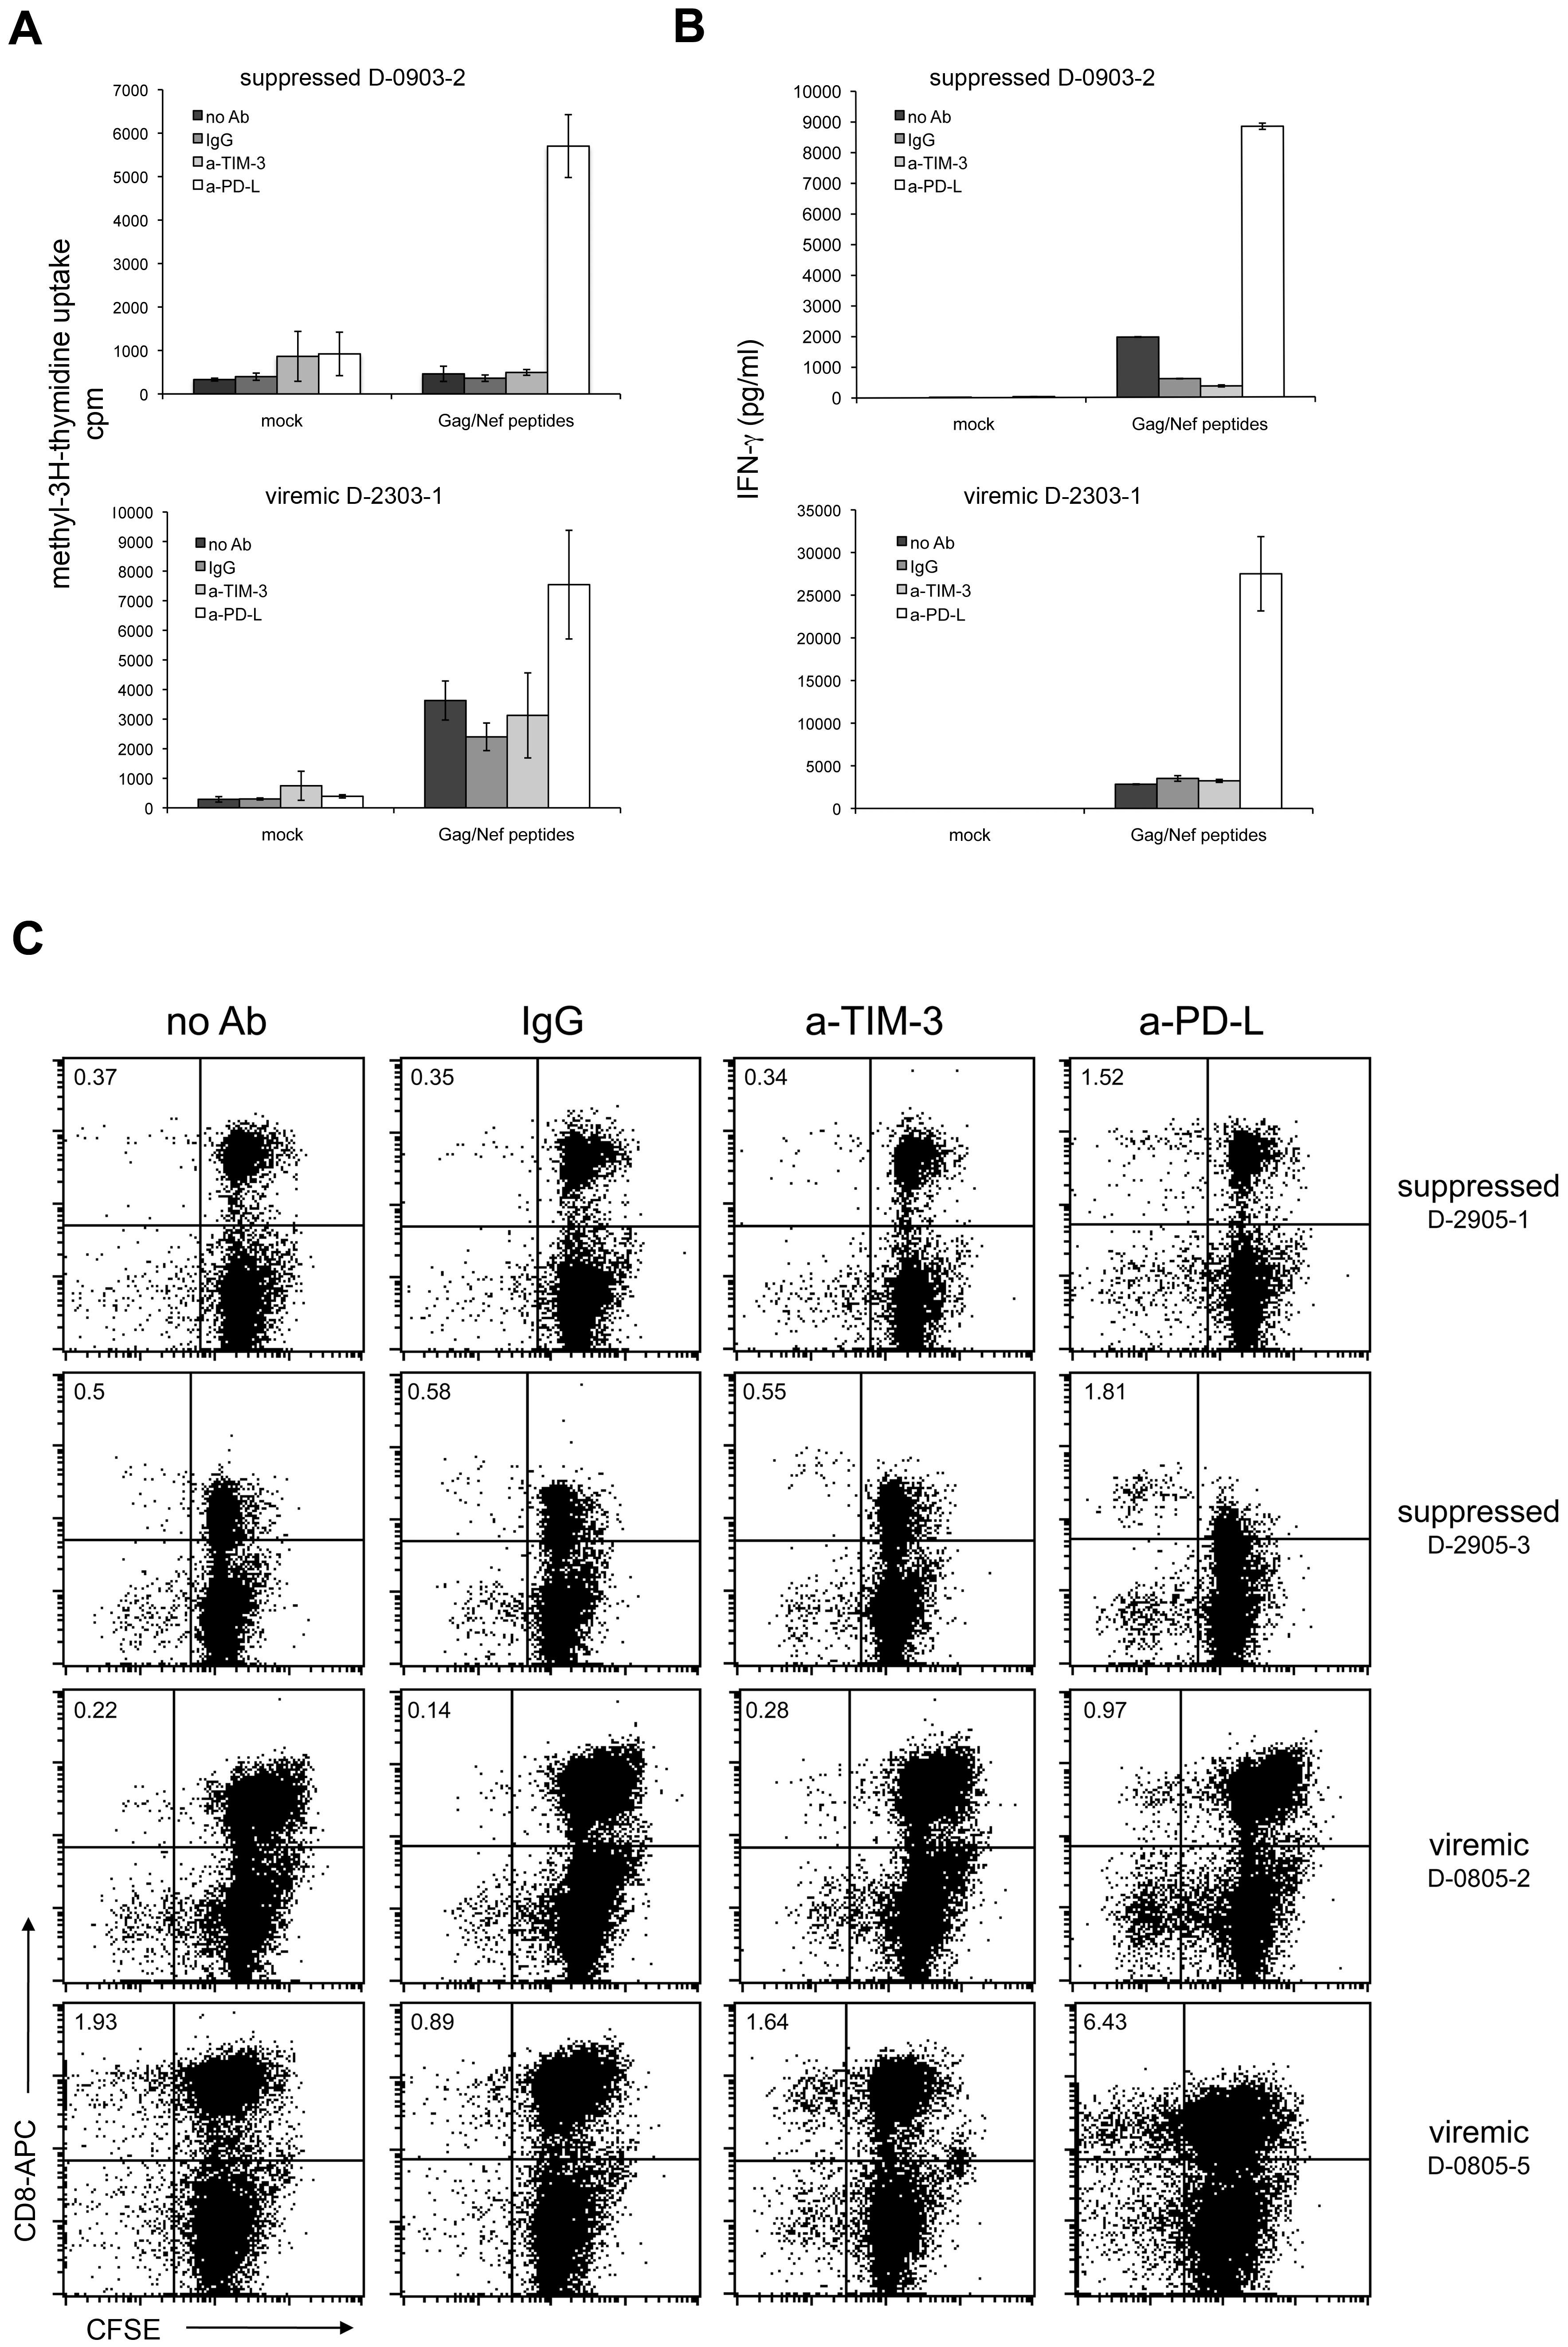 TIM-3 antibodies do not revert T cell exhaustion.